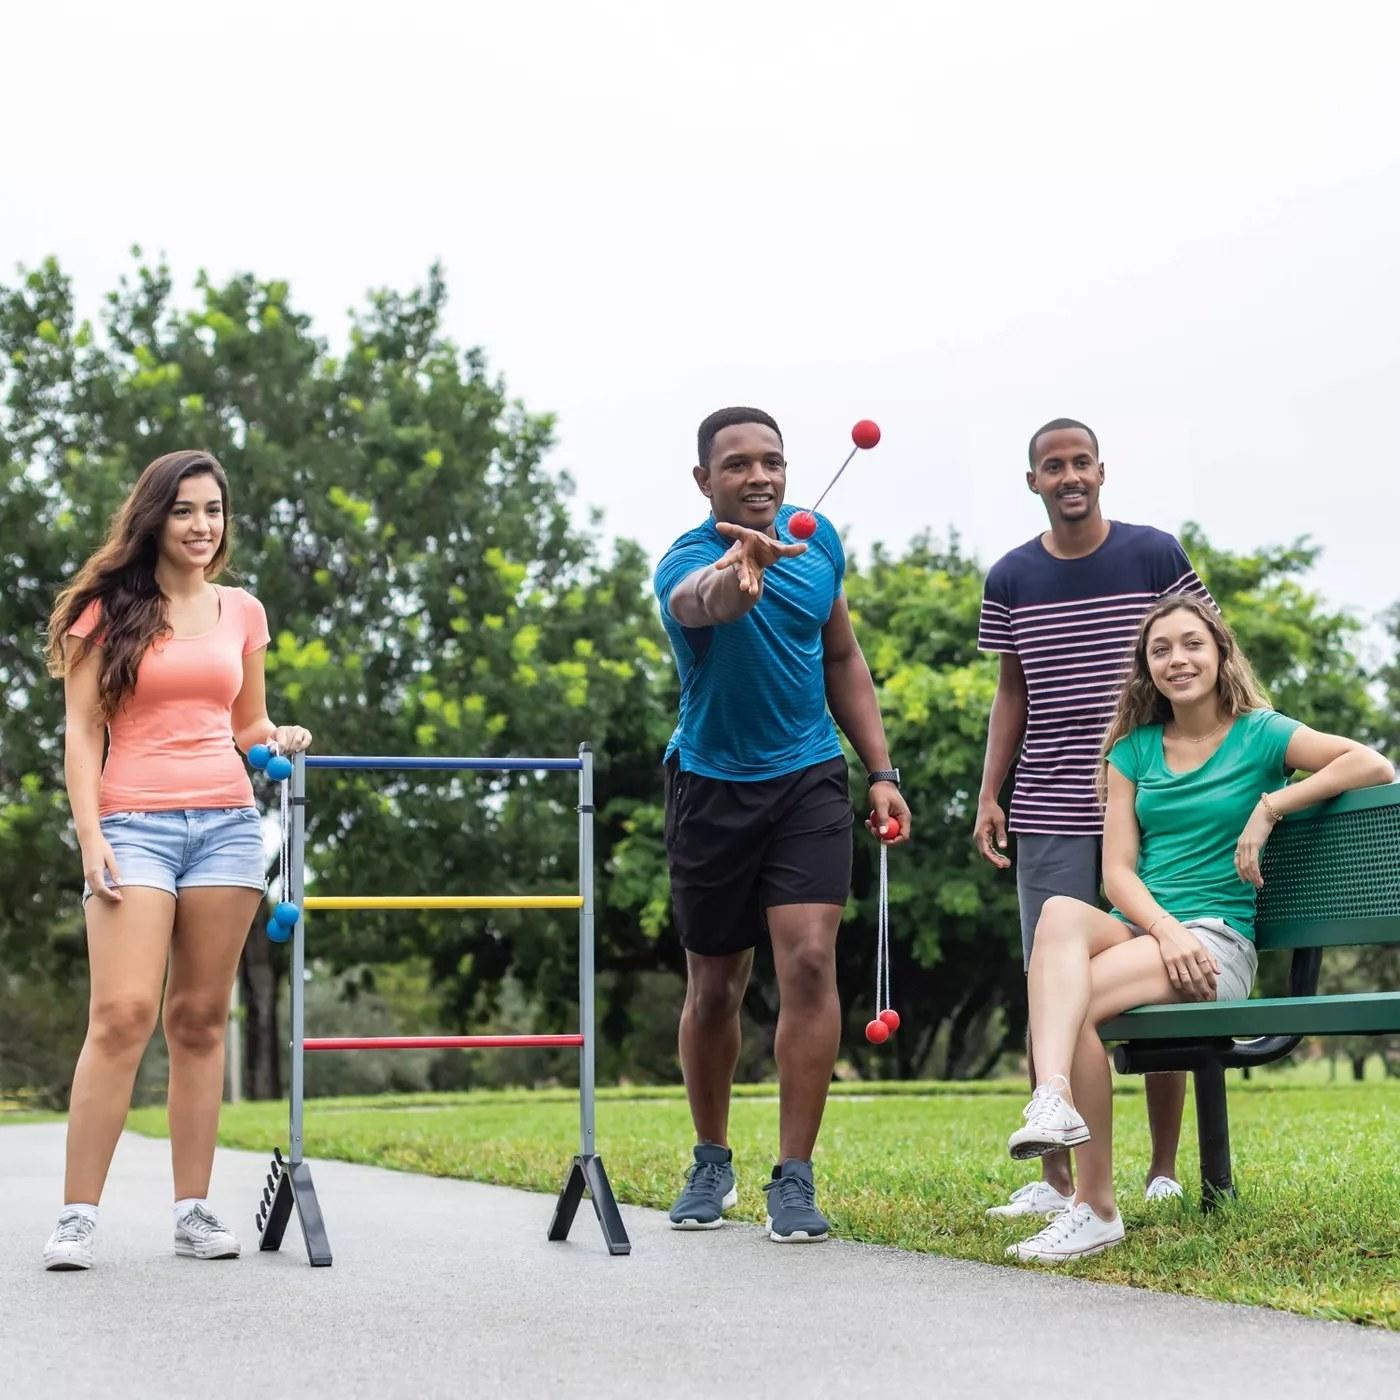 Models playing ladderball